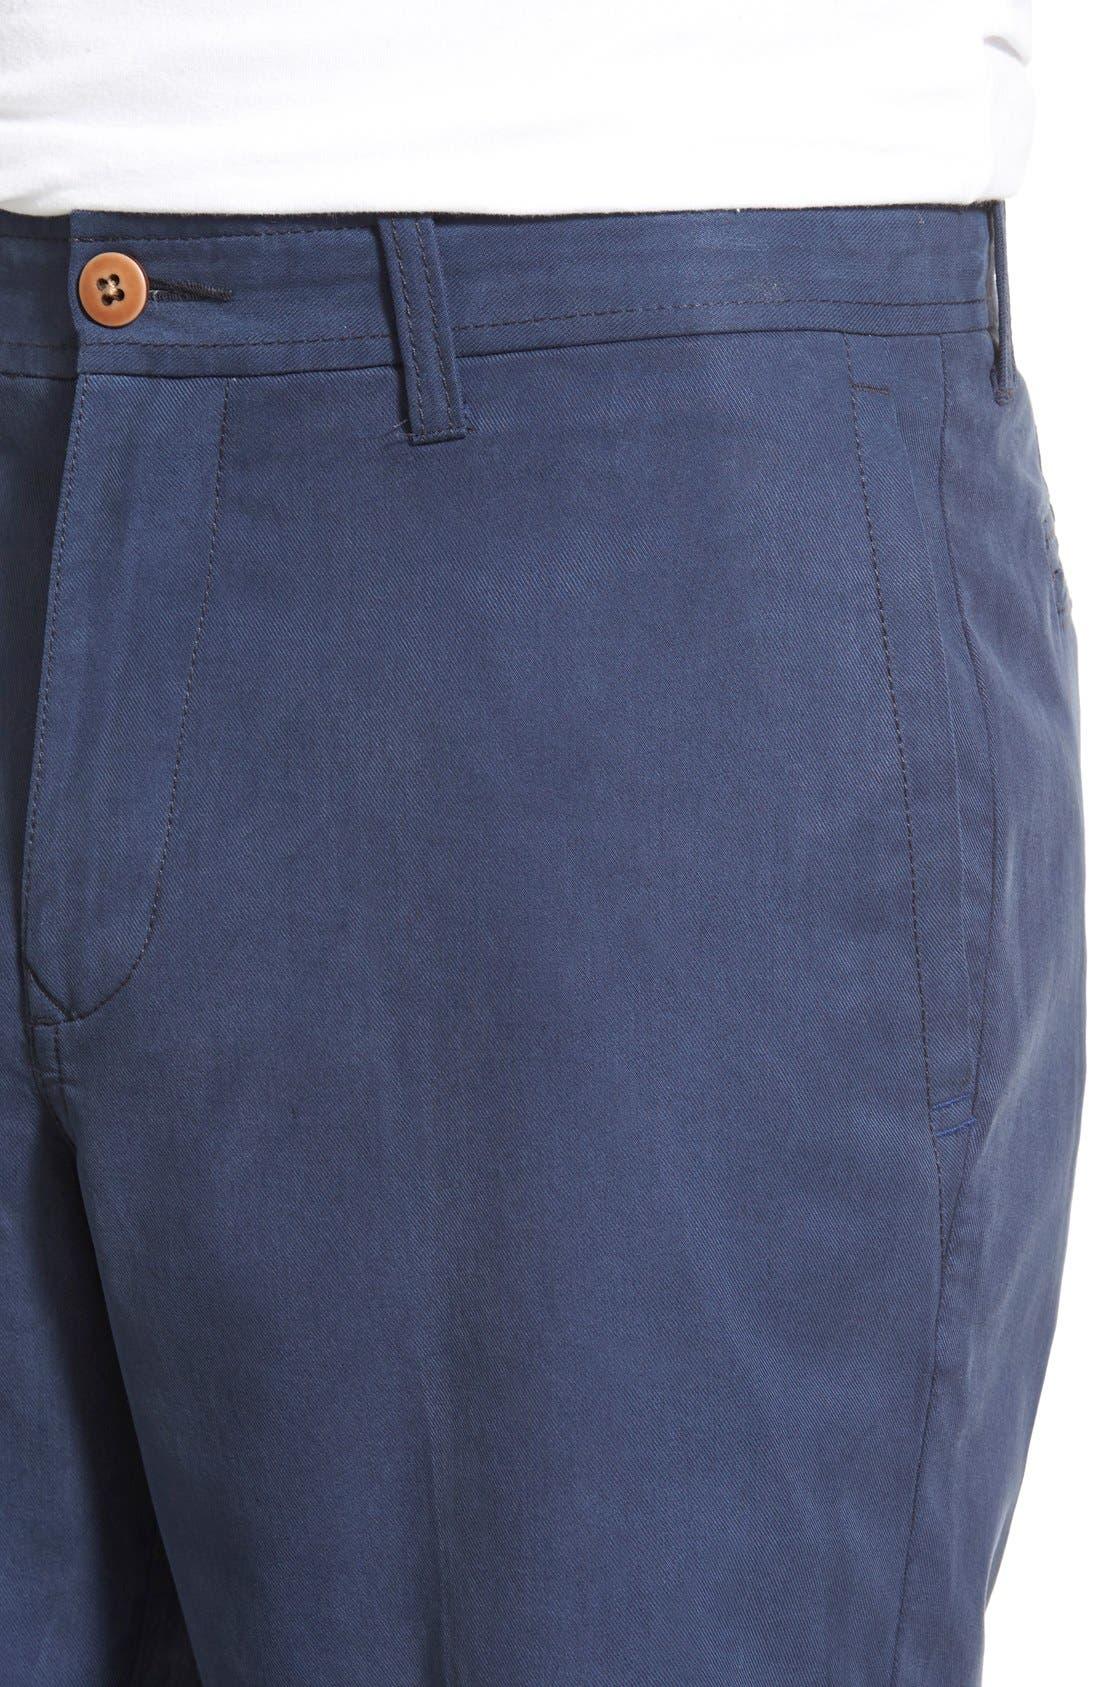 'Offshore' Flat Front Shorts,                             Alternate thumbnail 34, color,